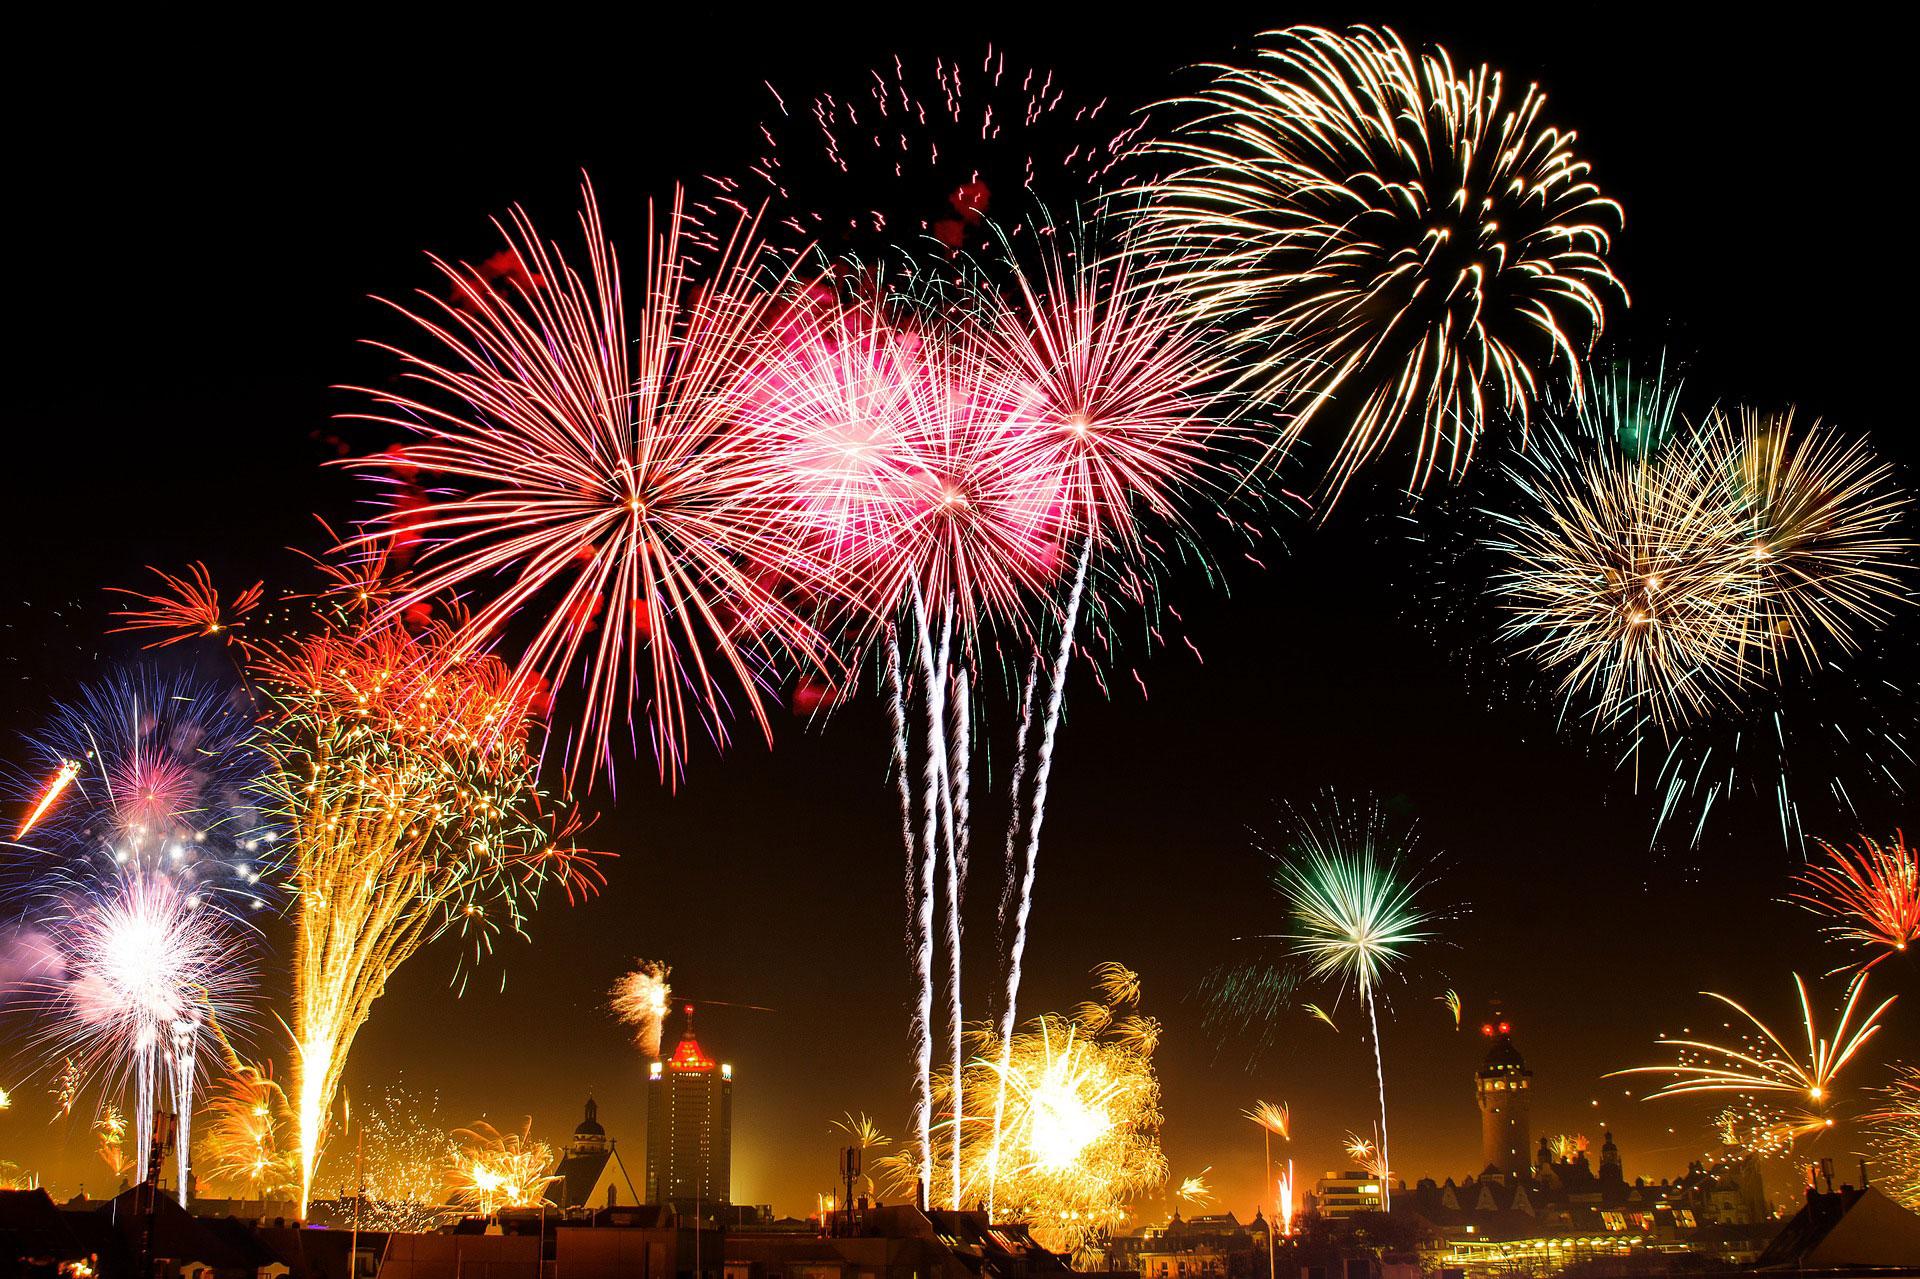 Cosa fare a Capodanno, What to do at New Years Eve, Qué hacer en Nochevieja, Was kann man an Silvester in Italien machen? 5 fantastische Ideen, jour de l'An en Italie